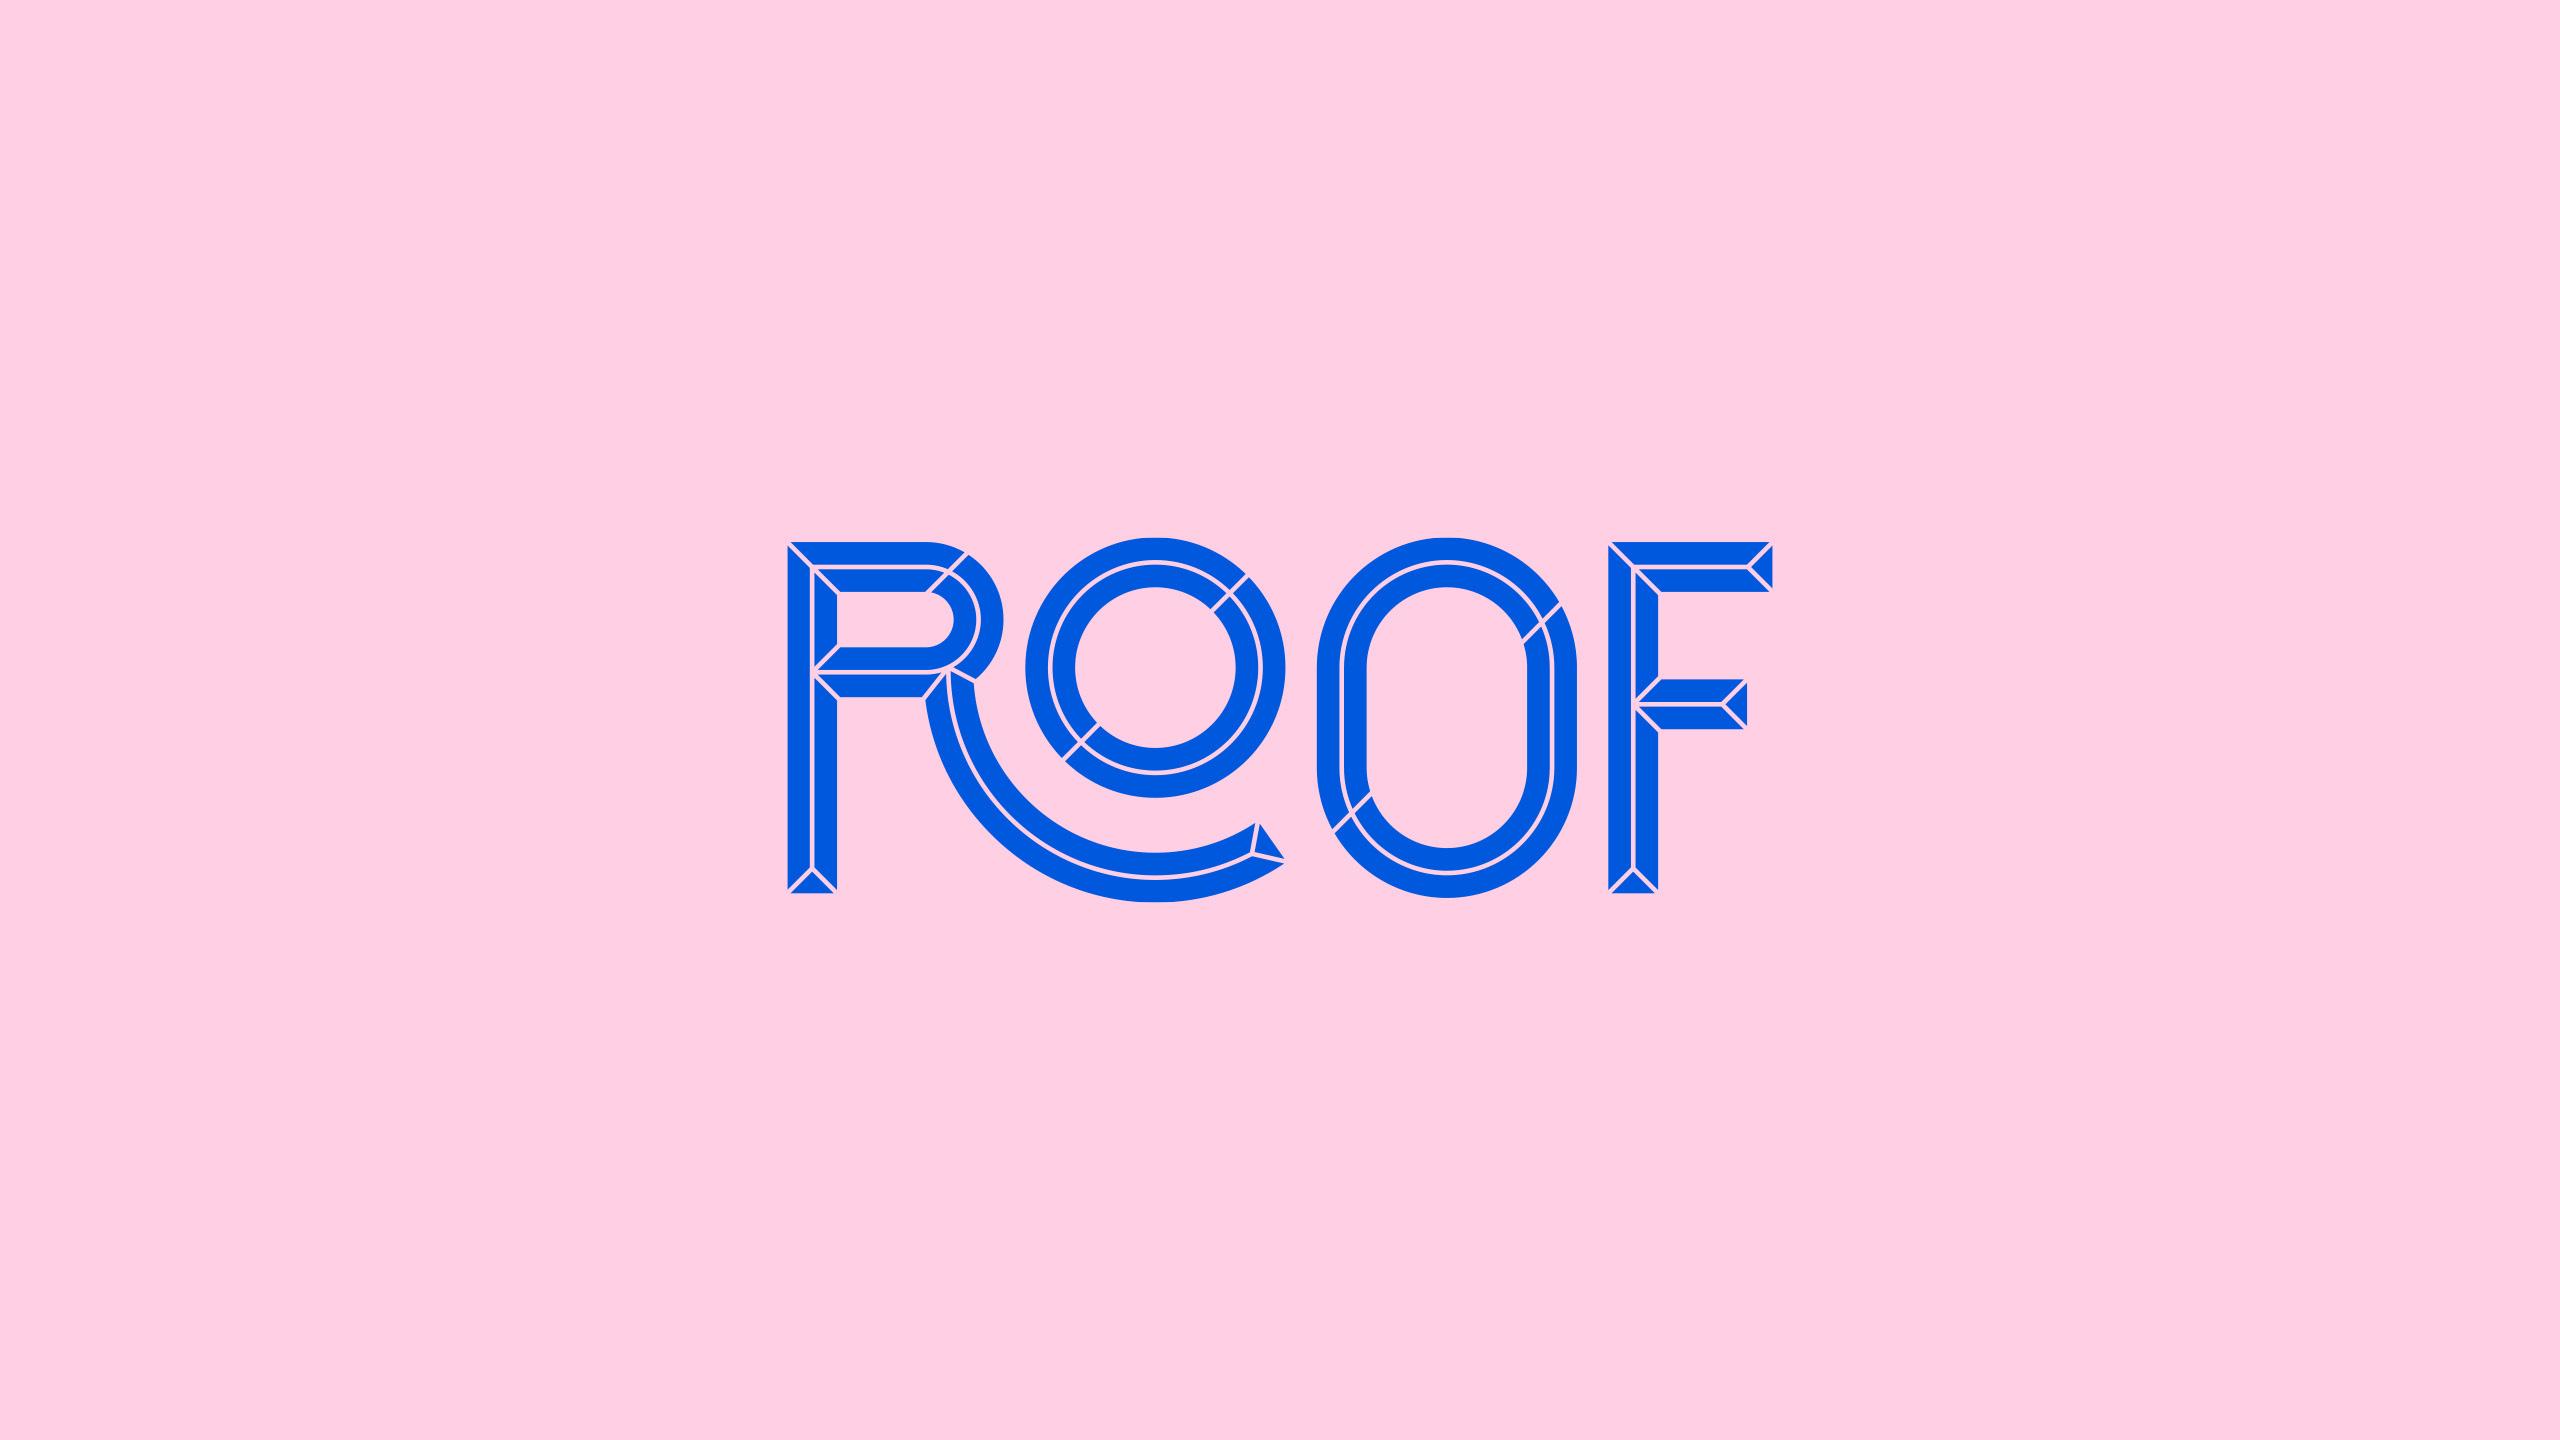 firmorama_roofstudio_02